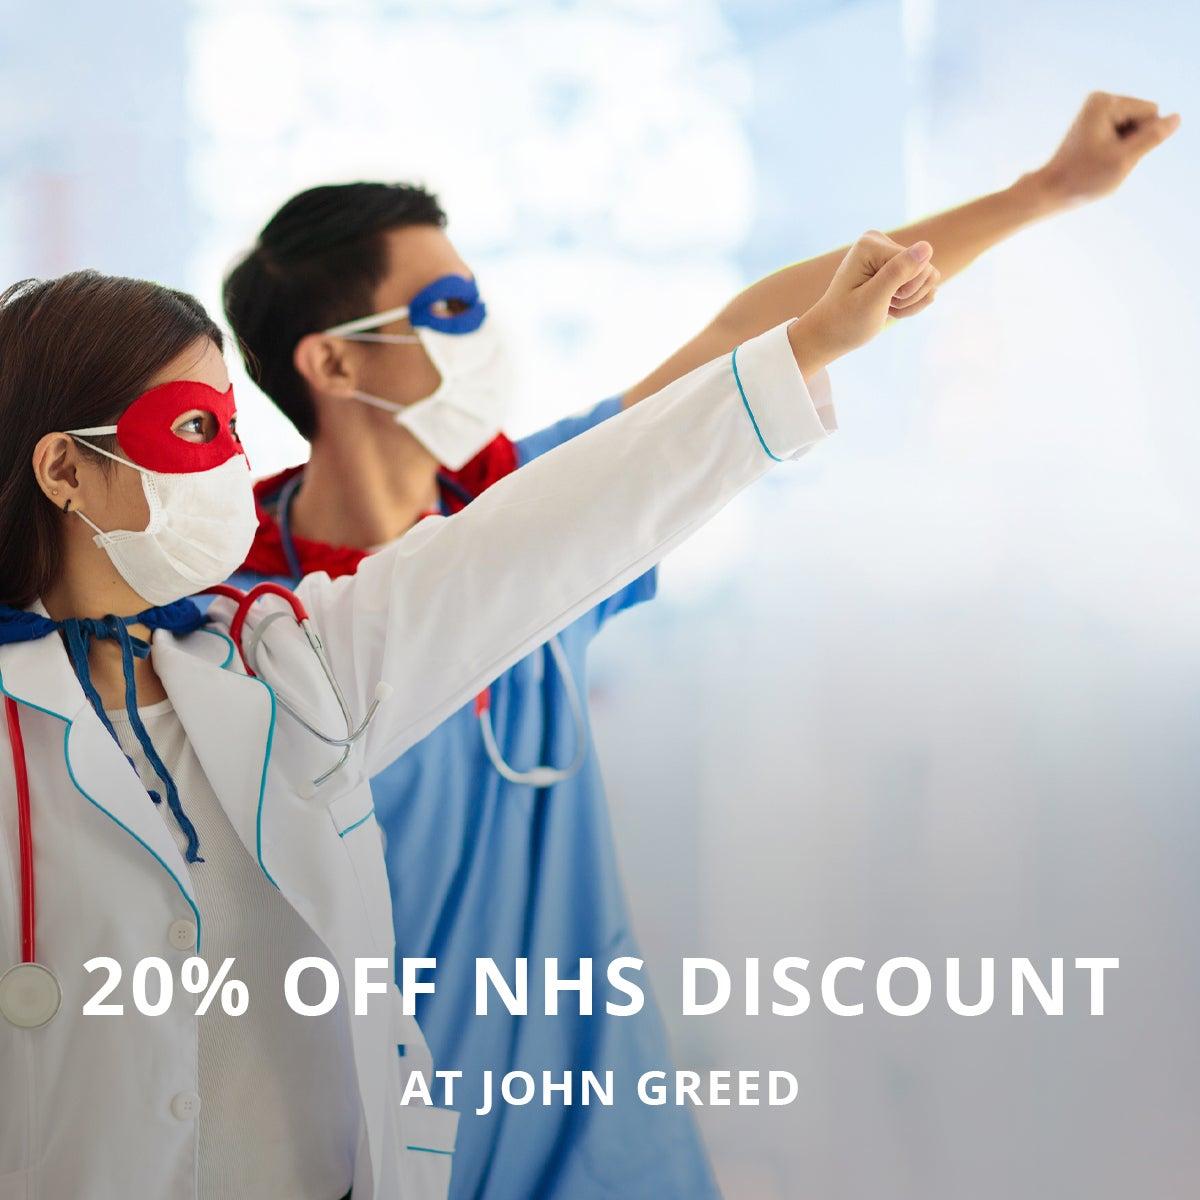 20% Off NHS Discount